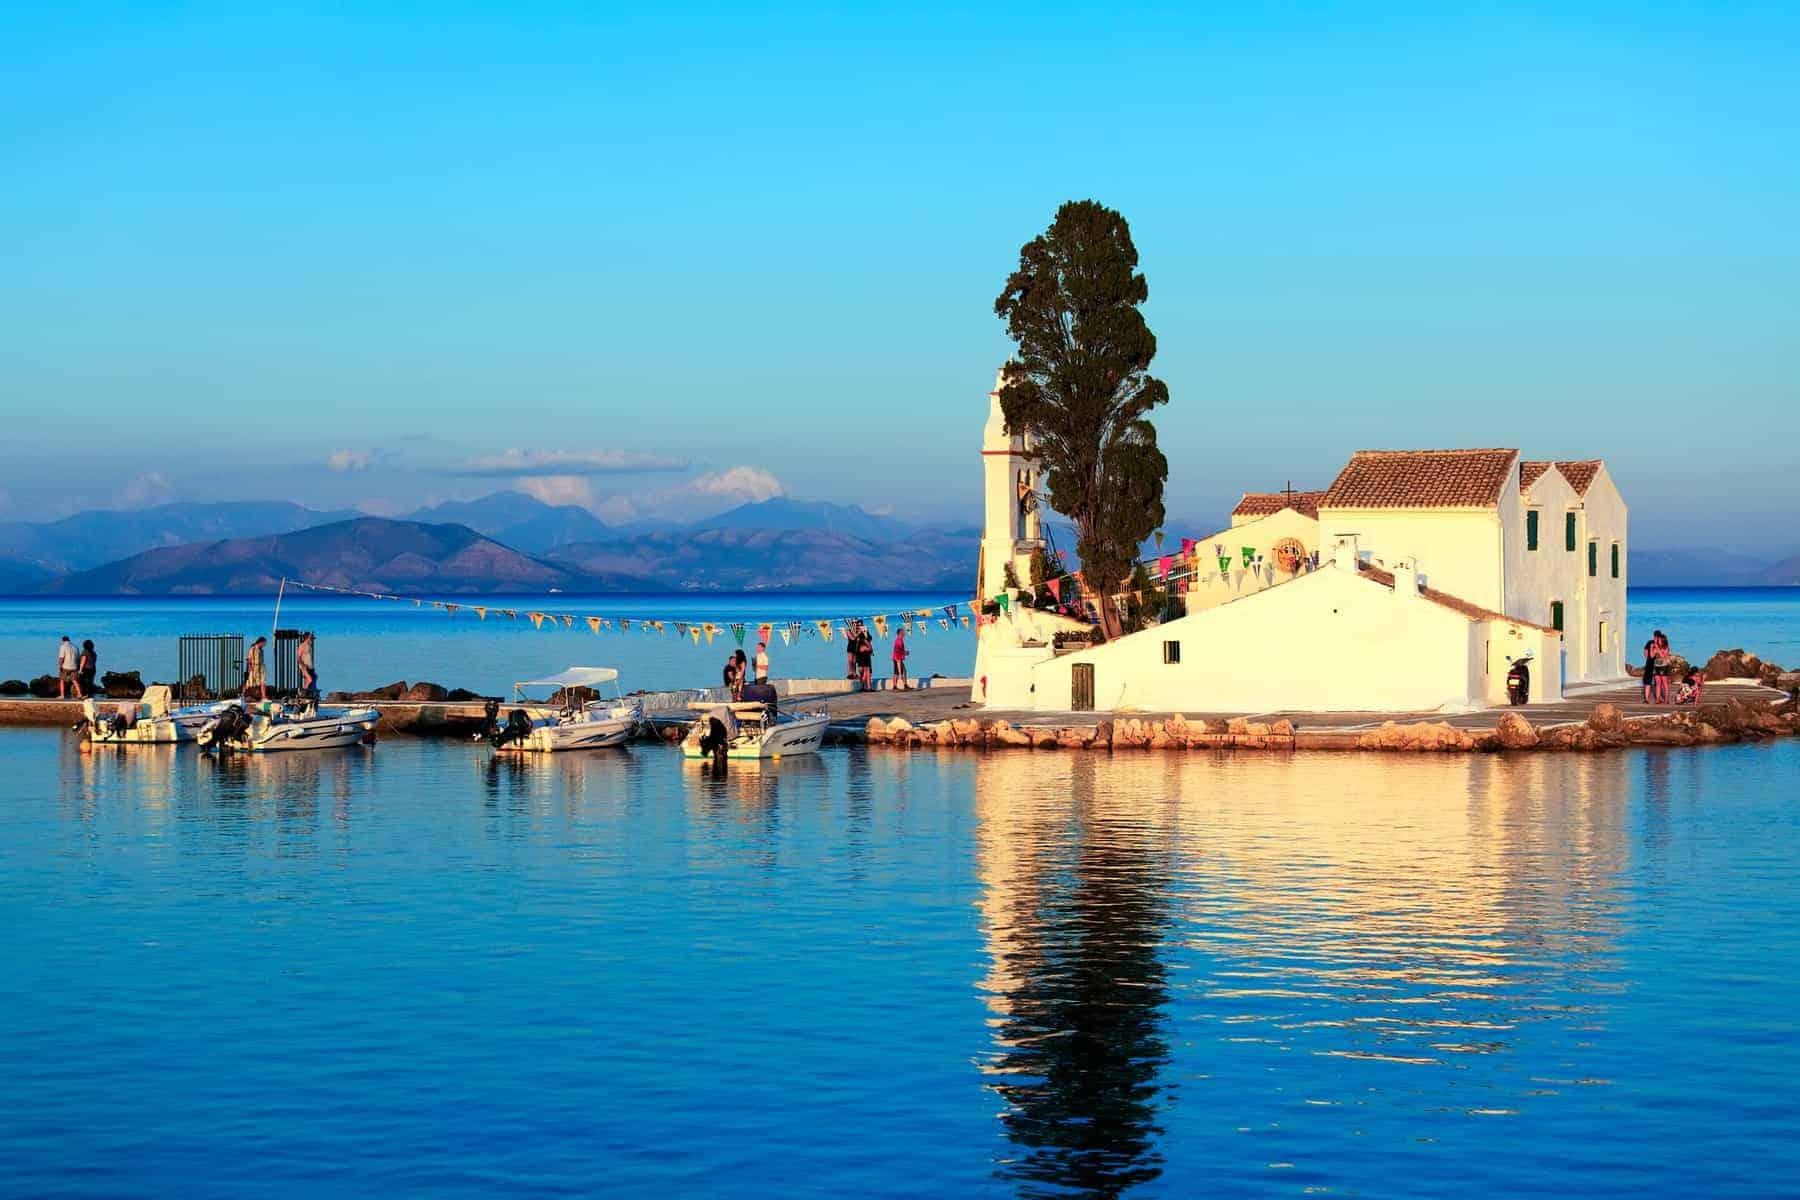 Græske øer. Vlacherna klostret i Kanoni, Korfu, Grækenland